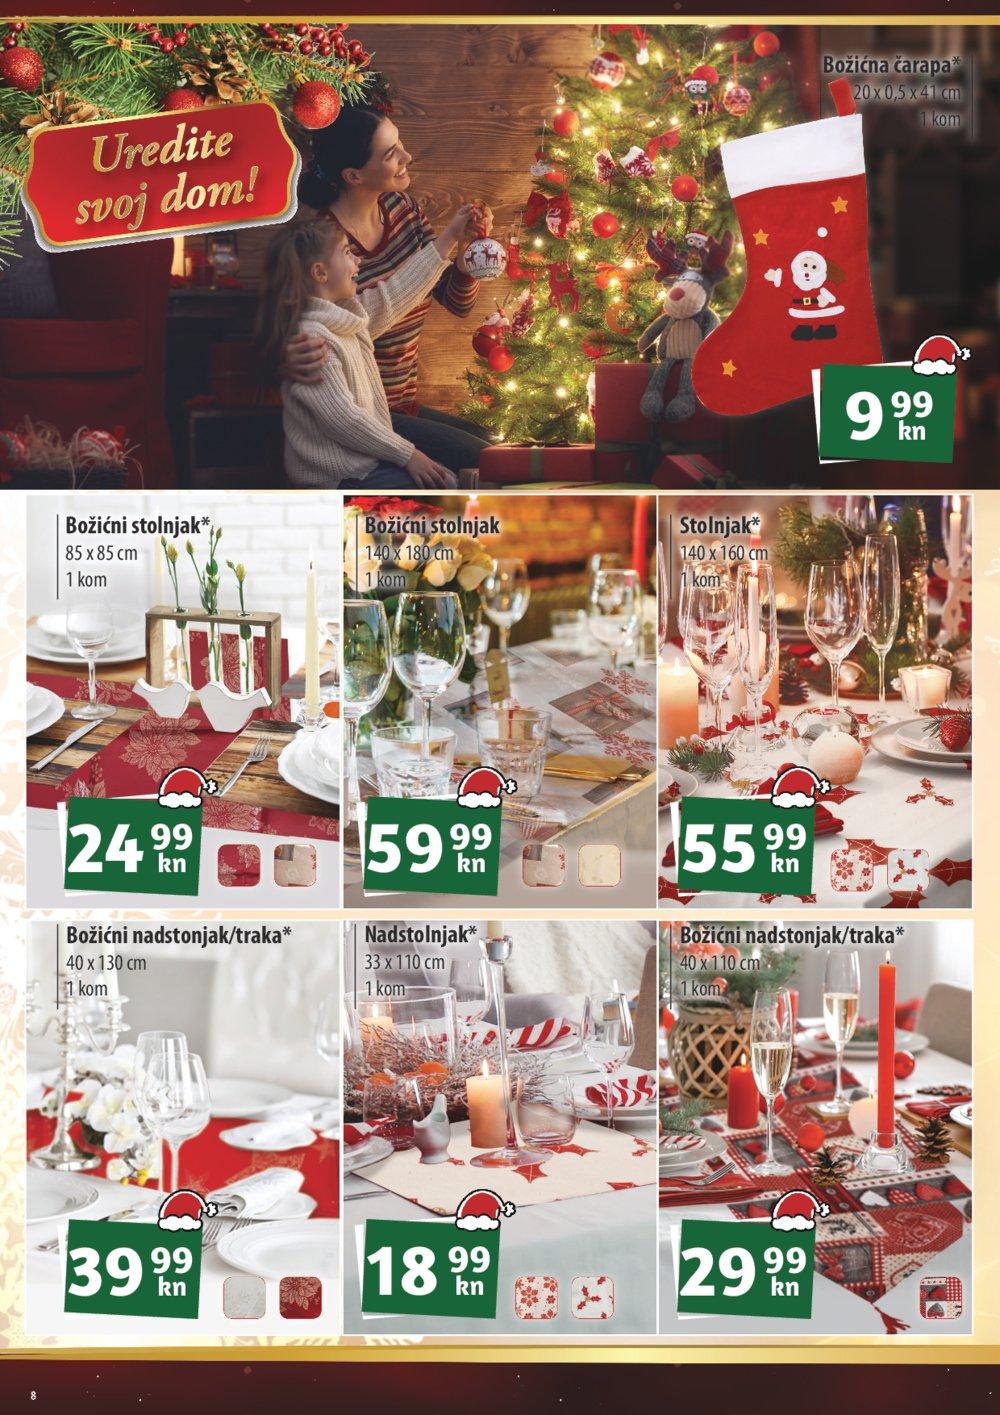 Trgostil NTL Maxi katalog Akcija 05.12.-11.12.2019.